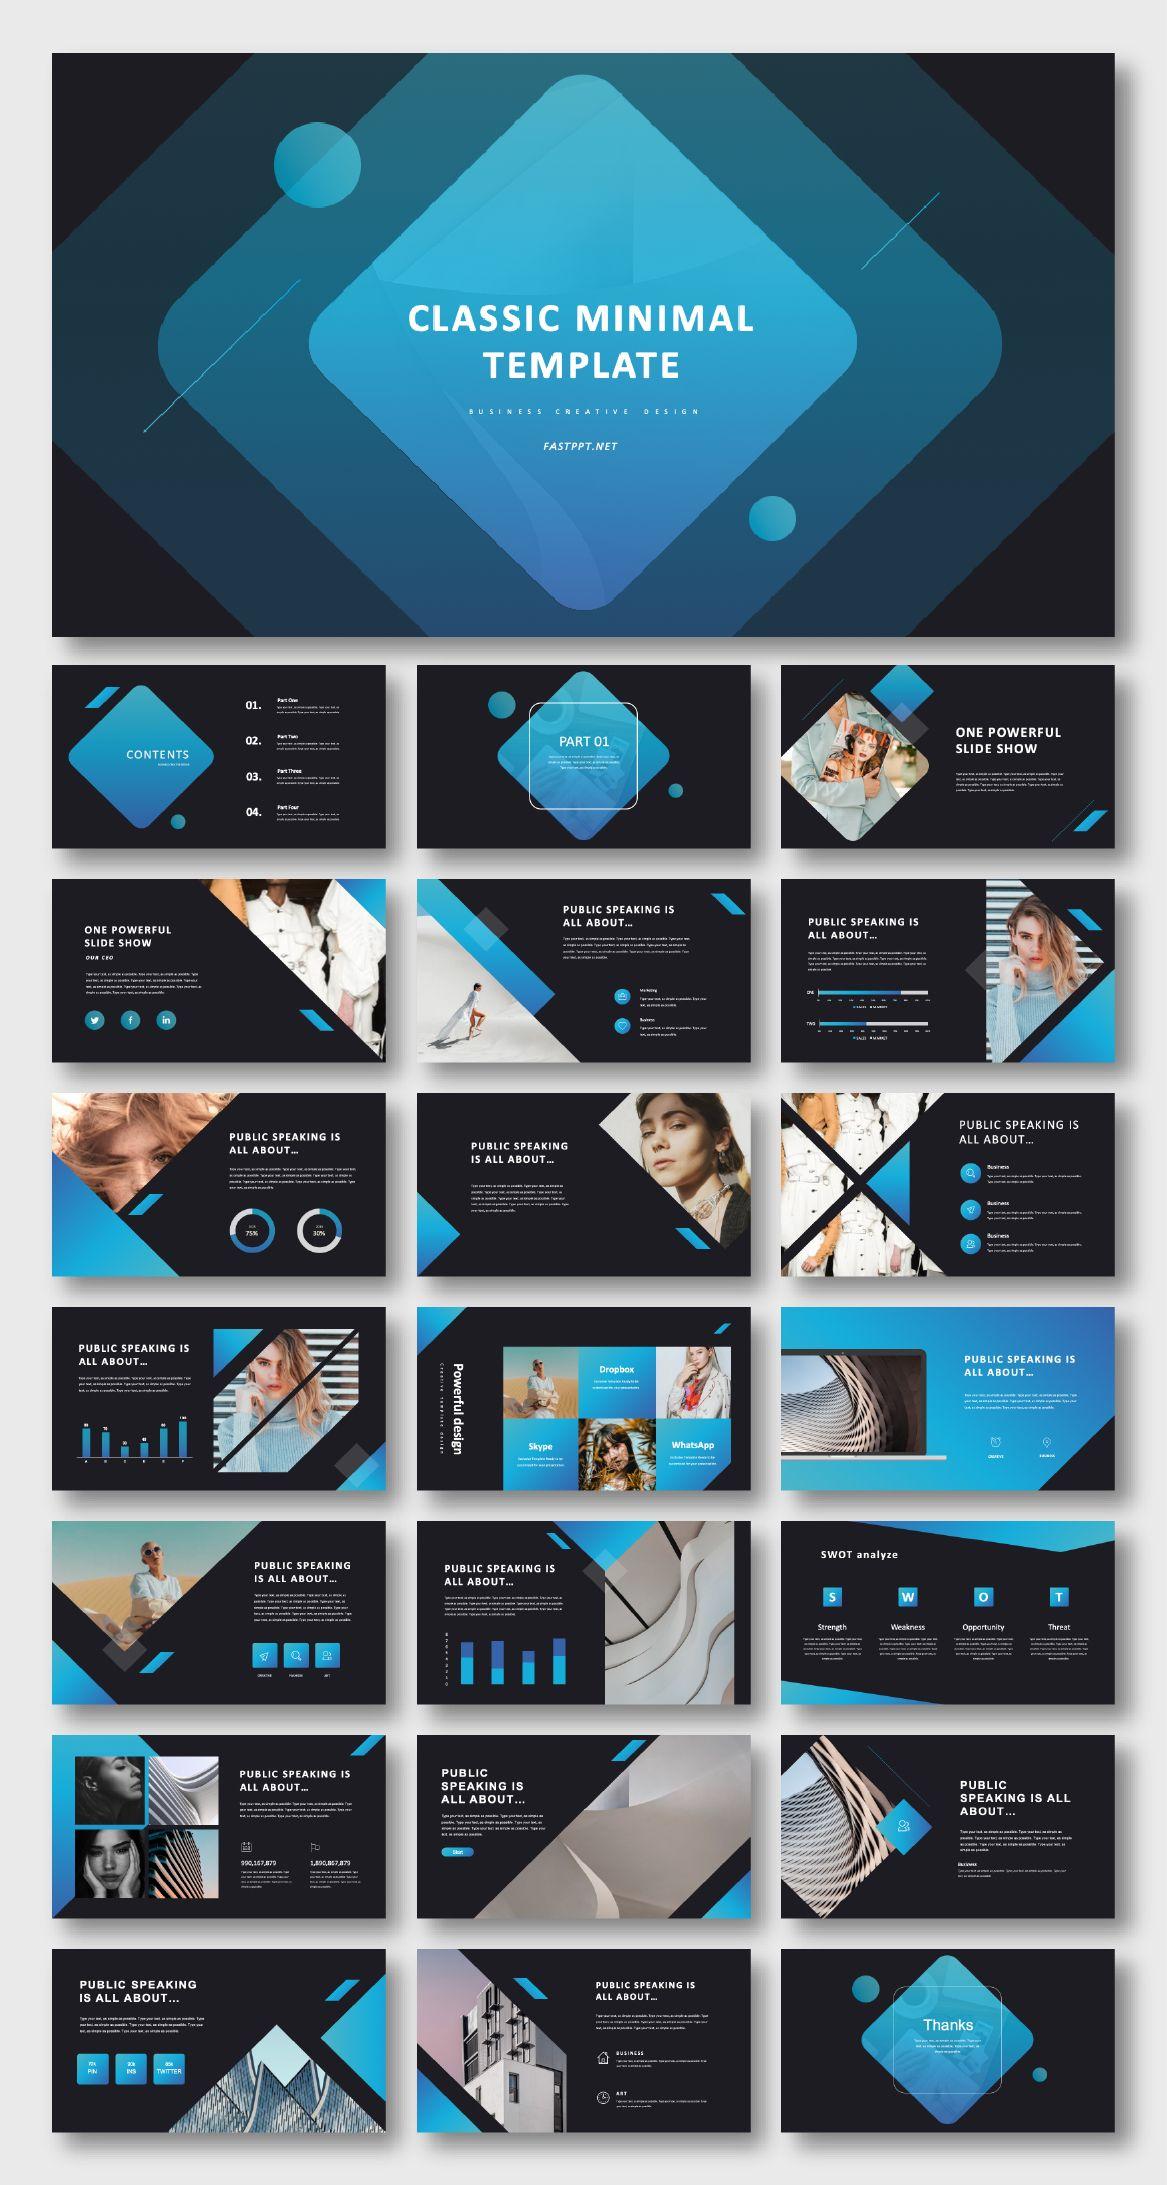 Annual Report Multipurpose Powerpoint Template Shablony Power Point Maket Prezentacii Dizajn Prezentacii